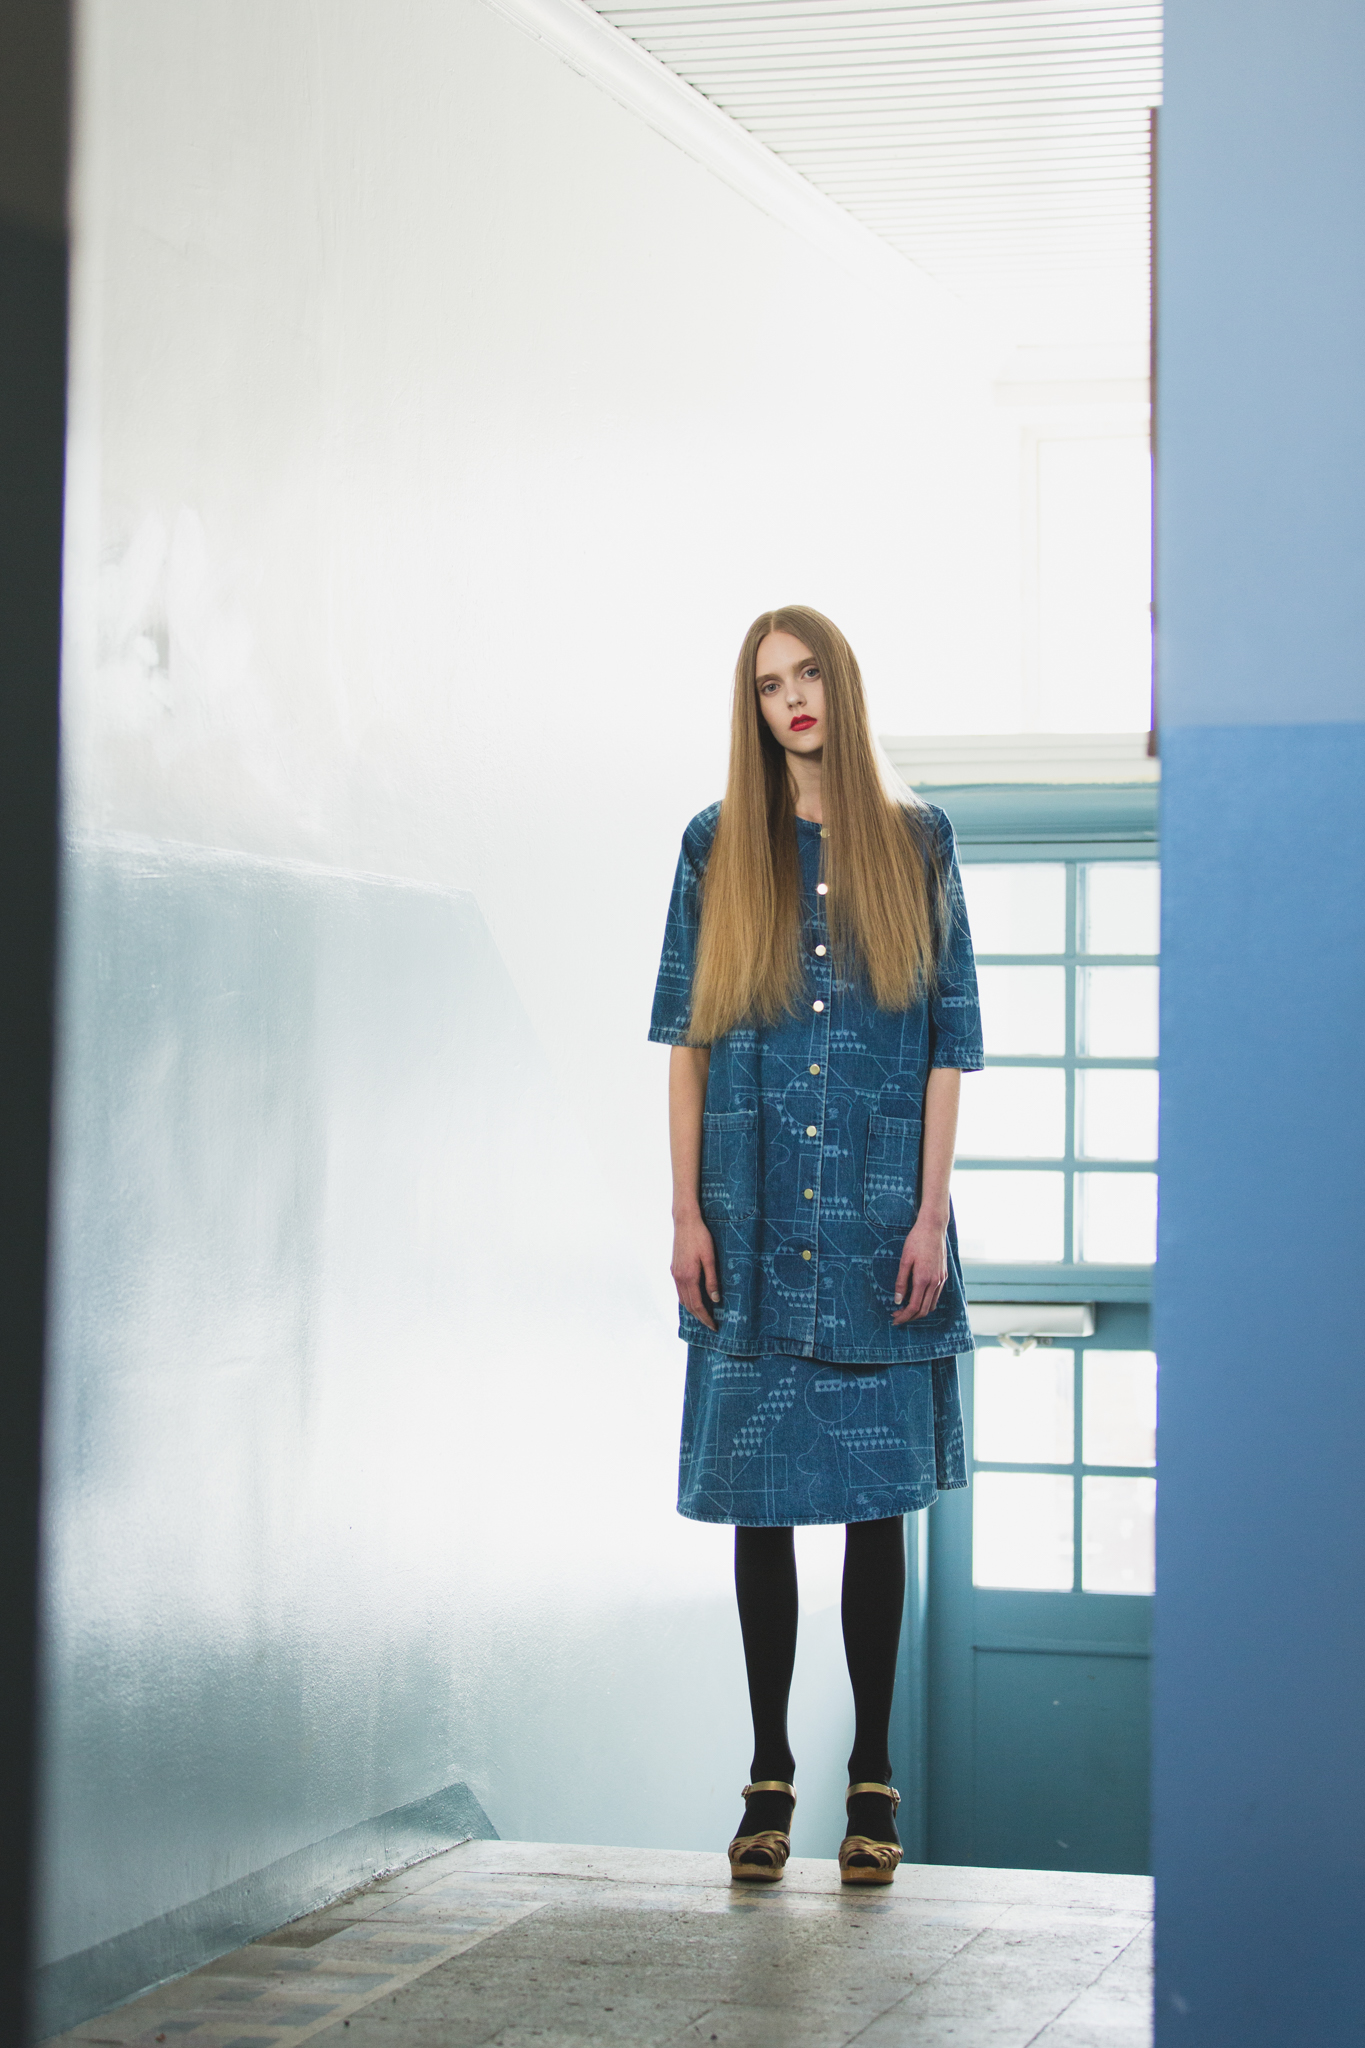 IvanaHelsinki-Moomin-aw1718-11.jpg